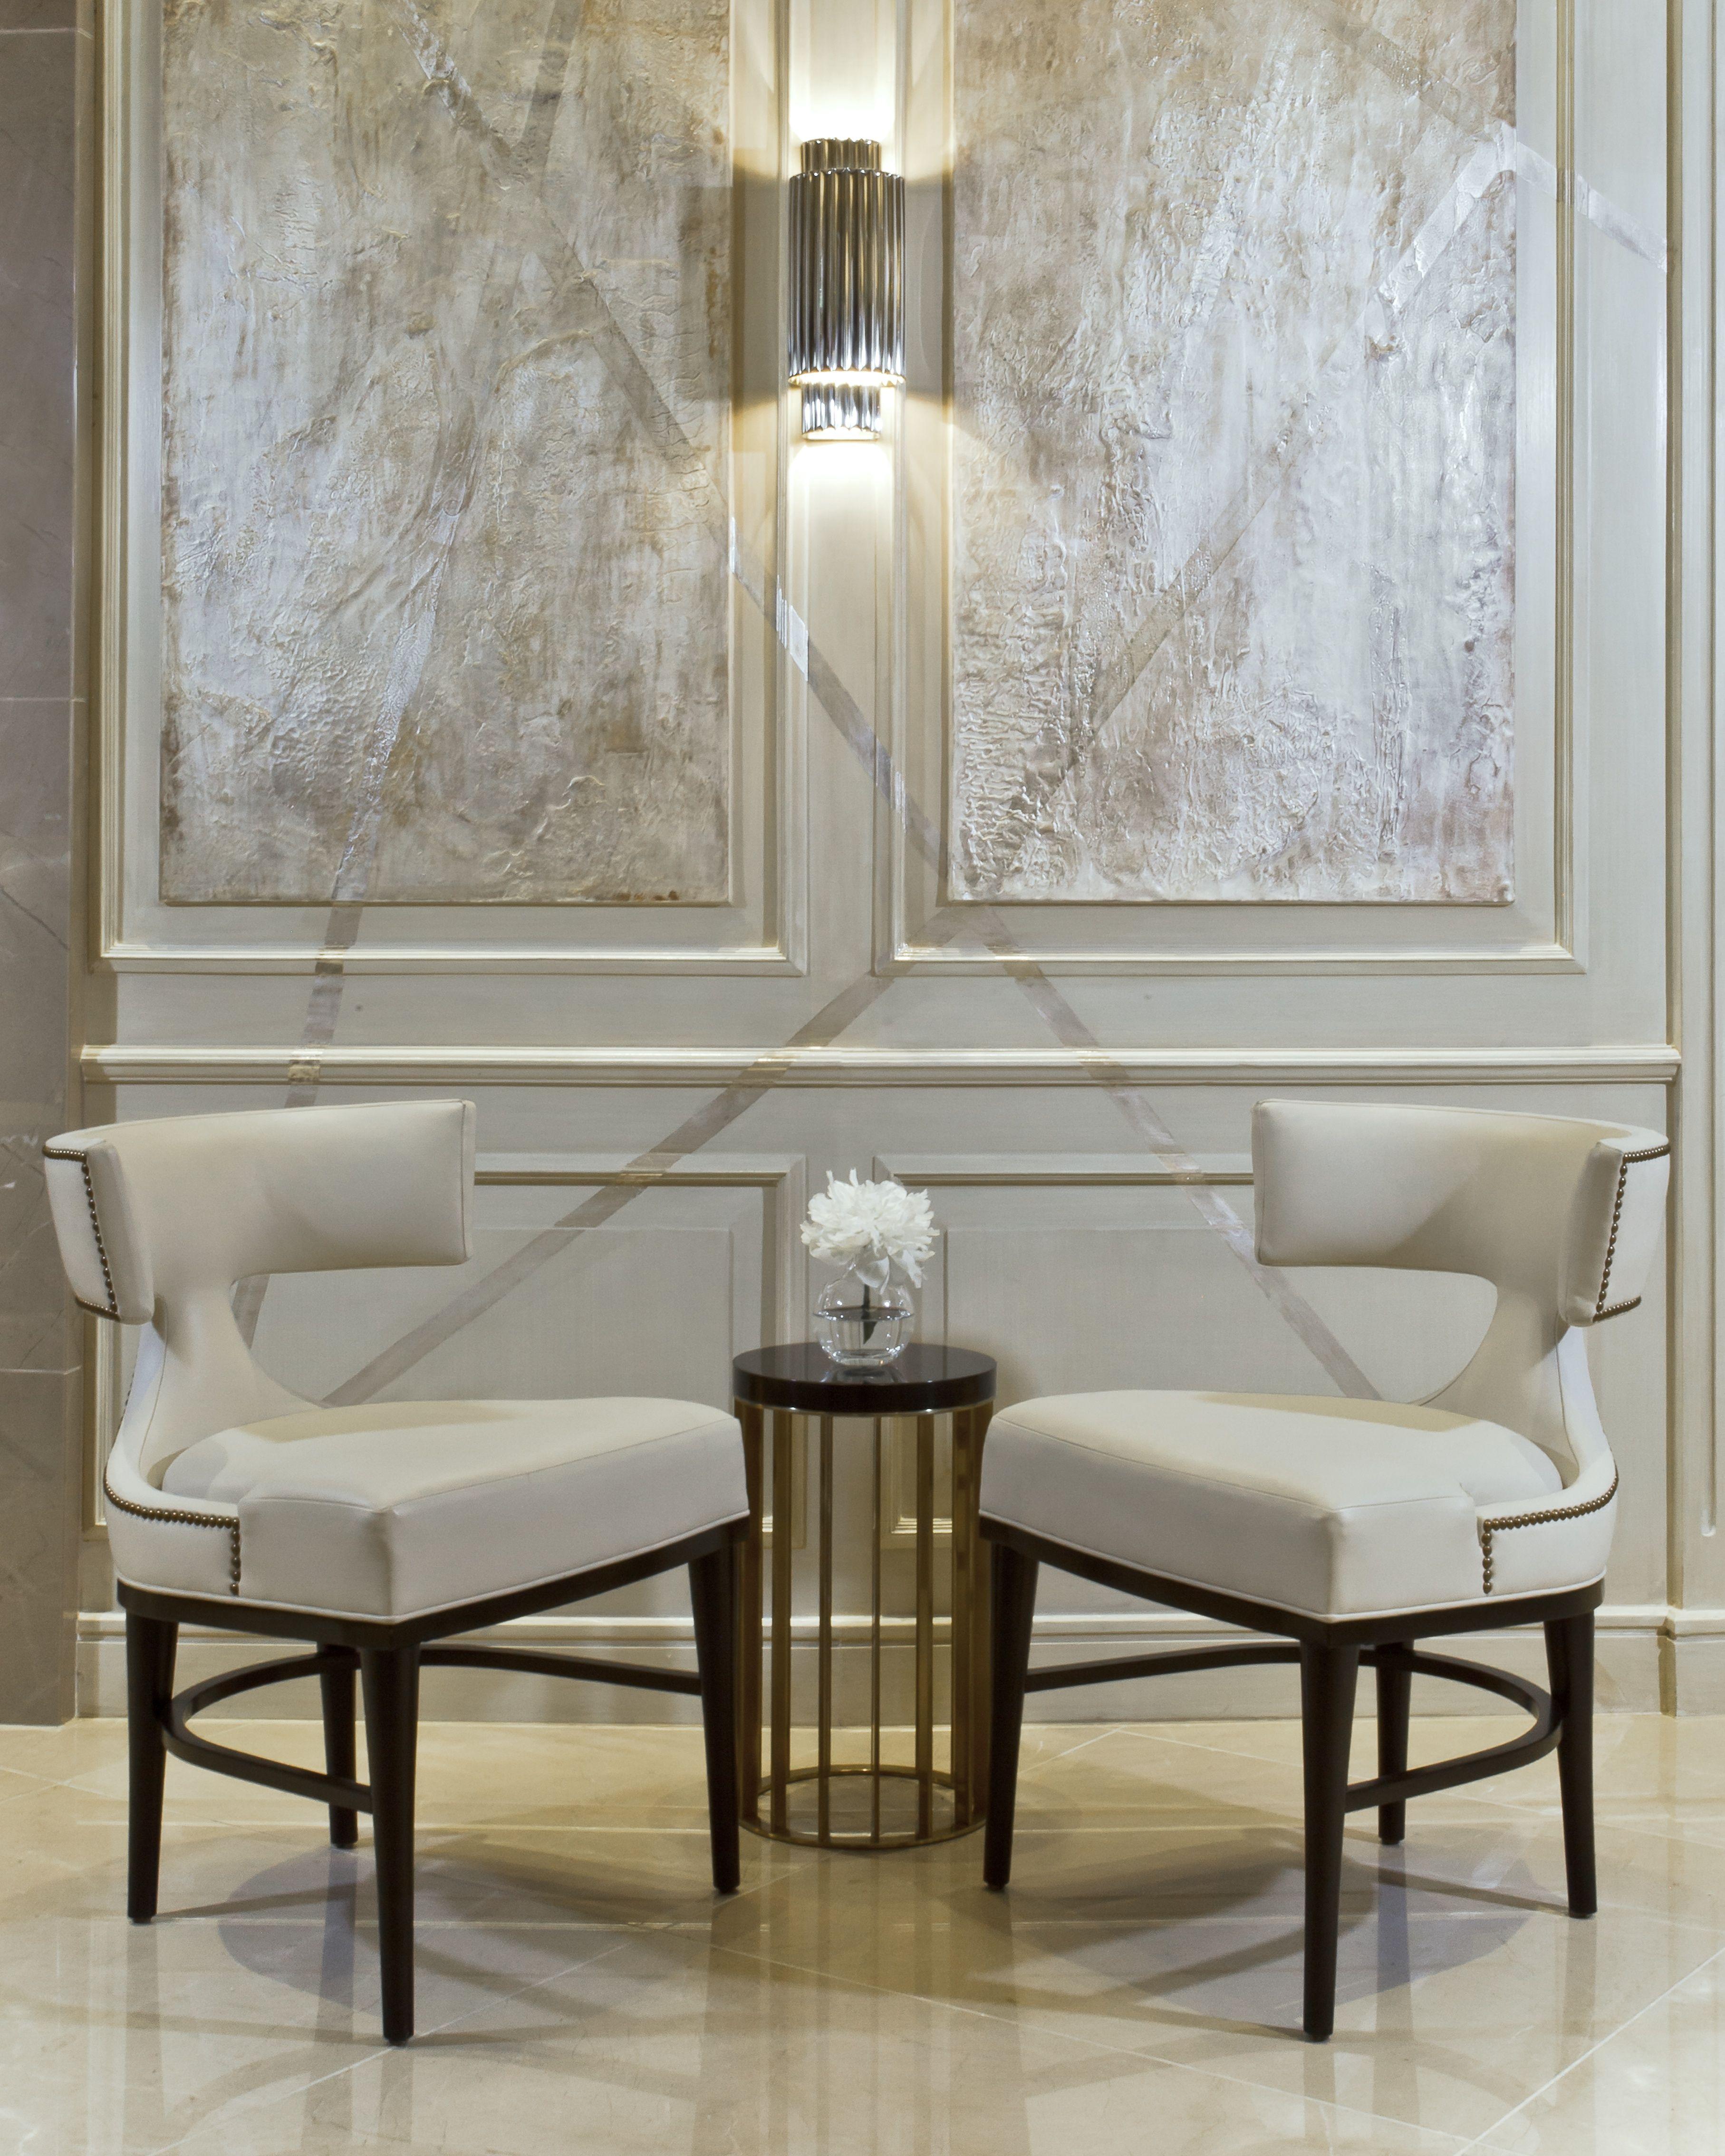 Oscar Dining Chairs By Reagan Hayes In The Sheraton Park Tower Lobby Knightsbridge London Design By Anita Rosato Furniture Design Interior Interior Design